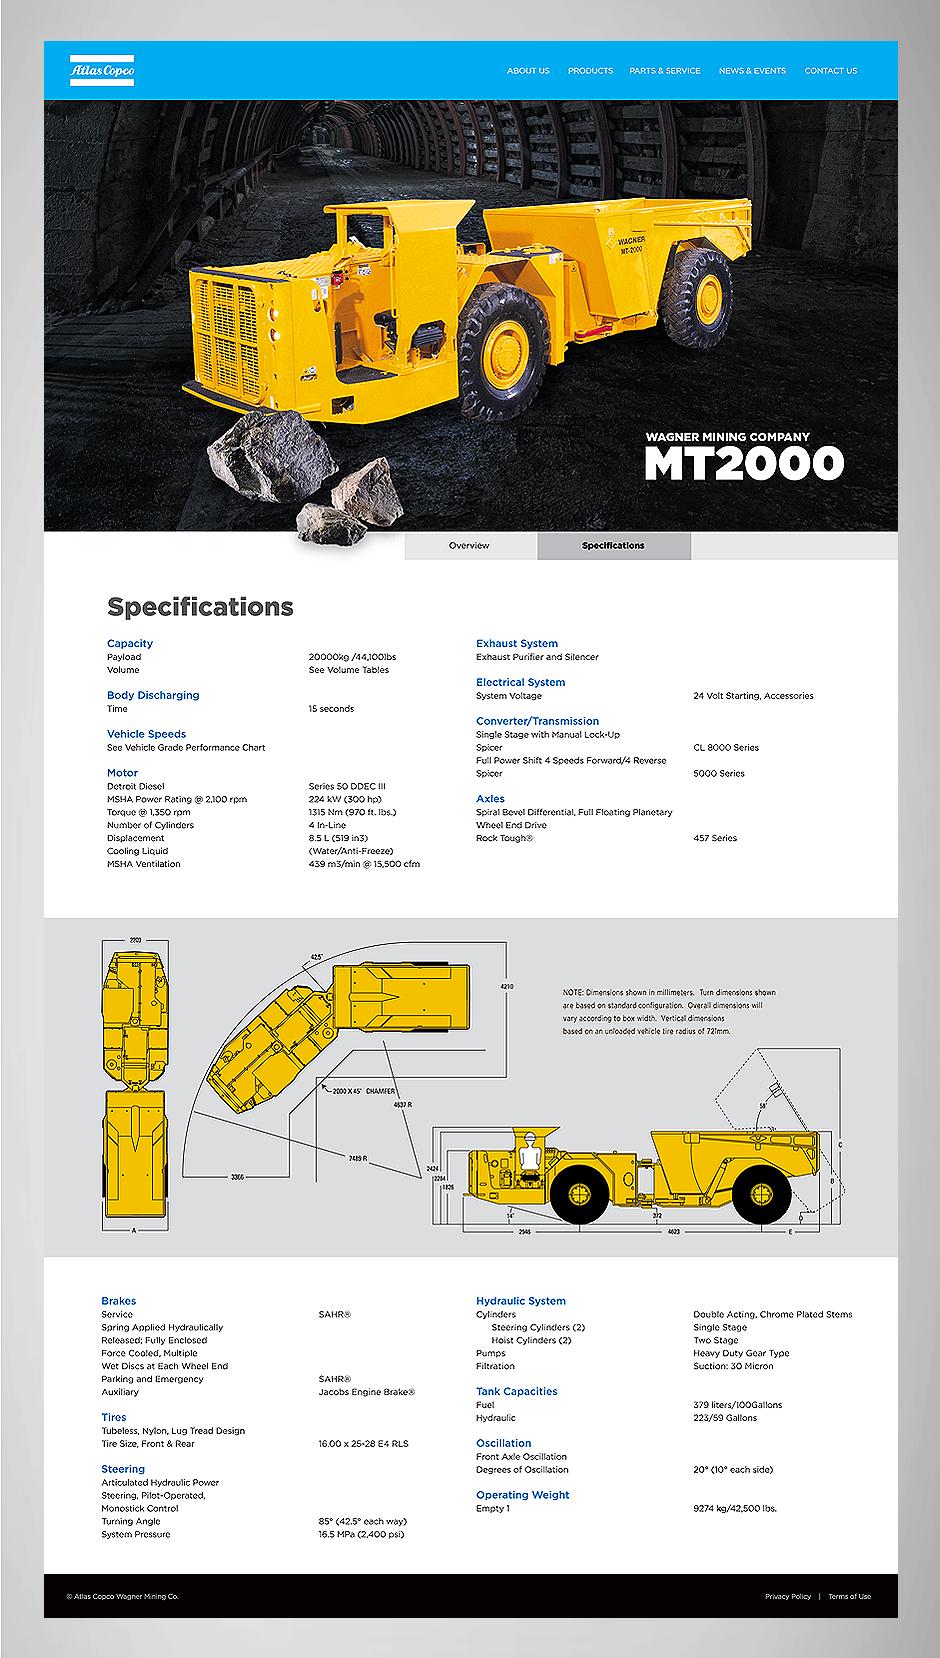 atlas-copco-wagner-mt2000-web-specifications